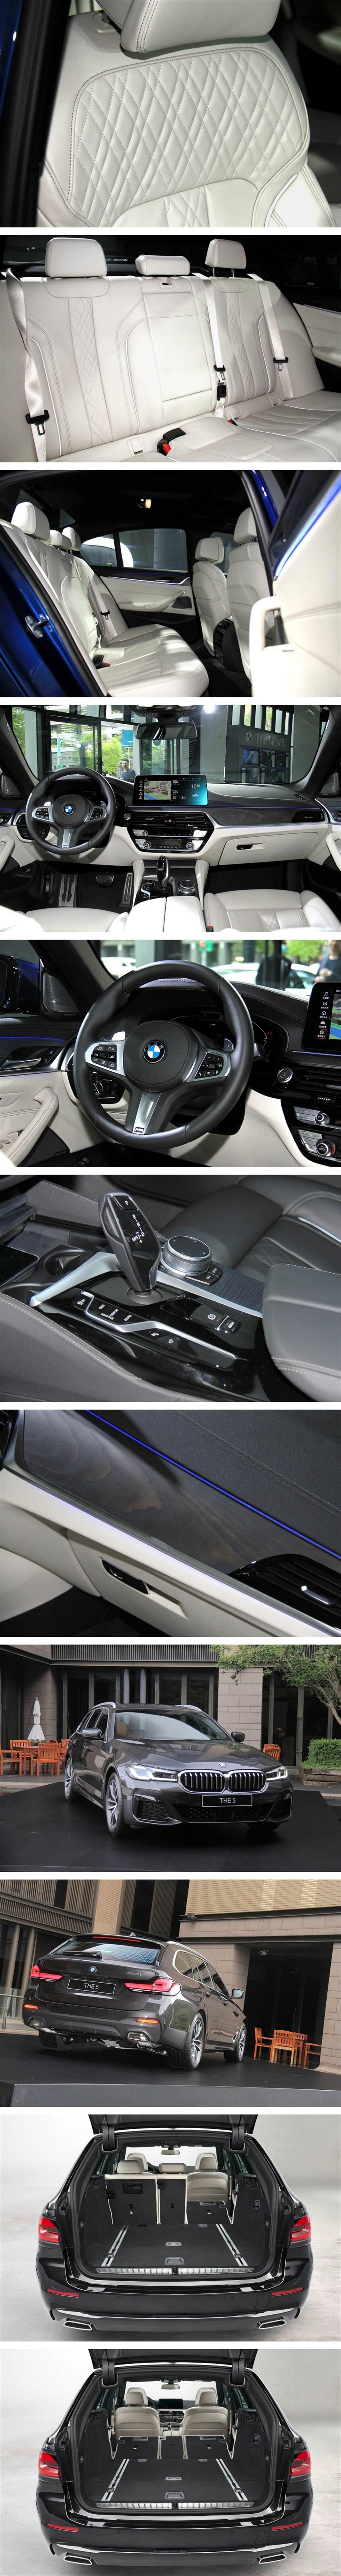 Touring車型也同步引進,初期先供應520i M Sport規格,首發版也同樣贈送抬頭顯示器、智慧LED頭燈與遠光燈輔助配備。另外也有提供V8動力530hp/750Nm的M550i xDrive,價格為468萬,而首發版特別贈送智慧型雷射頭燈。無論是近燈或遠燈都有更強大的照明度,當時速超過60km/h時,會增強無眩光的遠光燈,並順著行進道路的狀況自適應智能遮罩控制。最遠照射距離可達650米,幾乎是新5系列所標配大燈的兩倍。